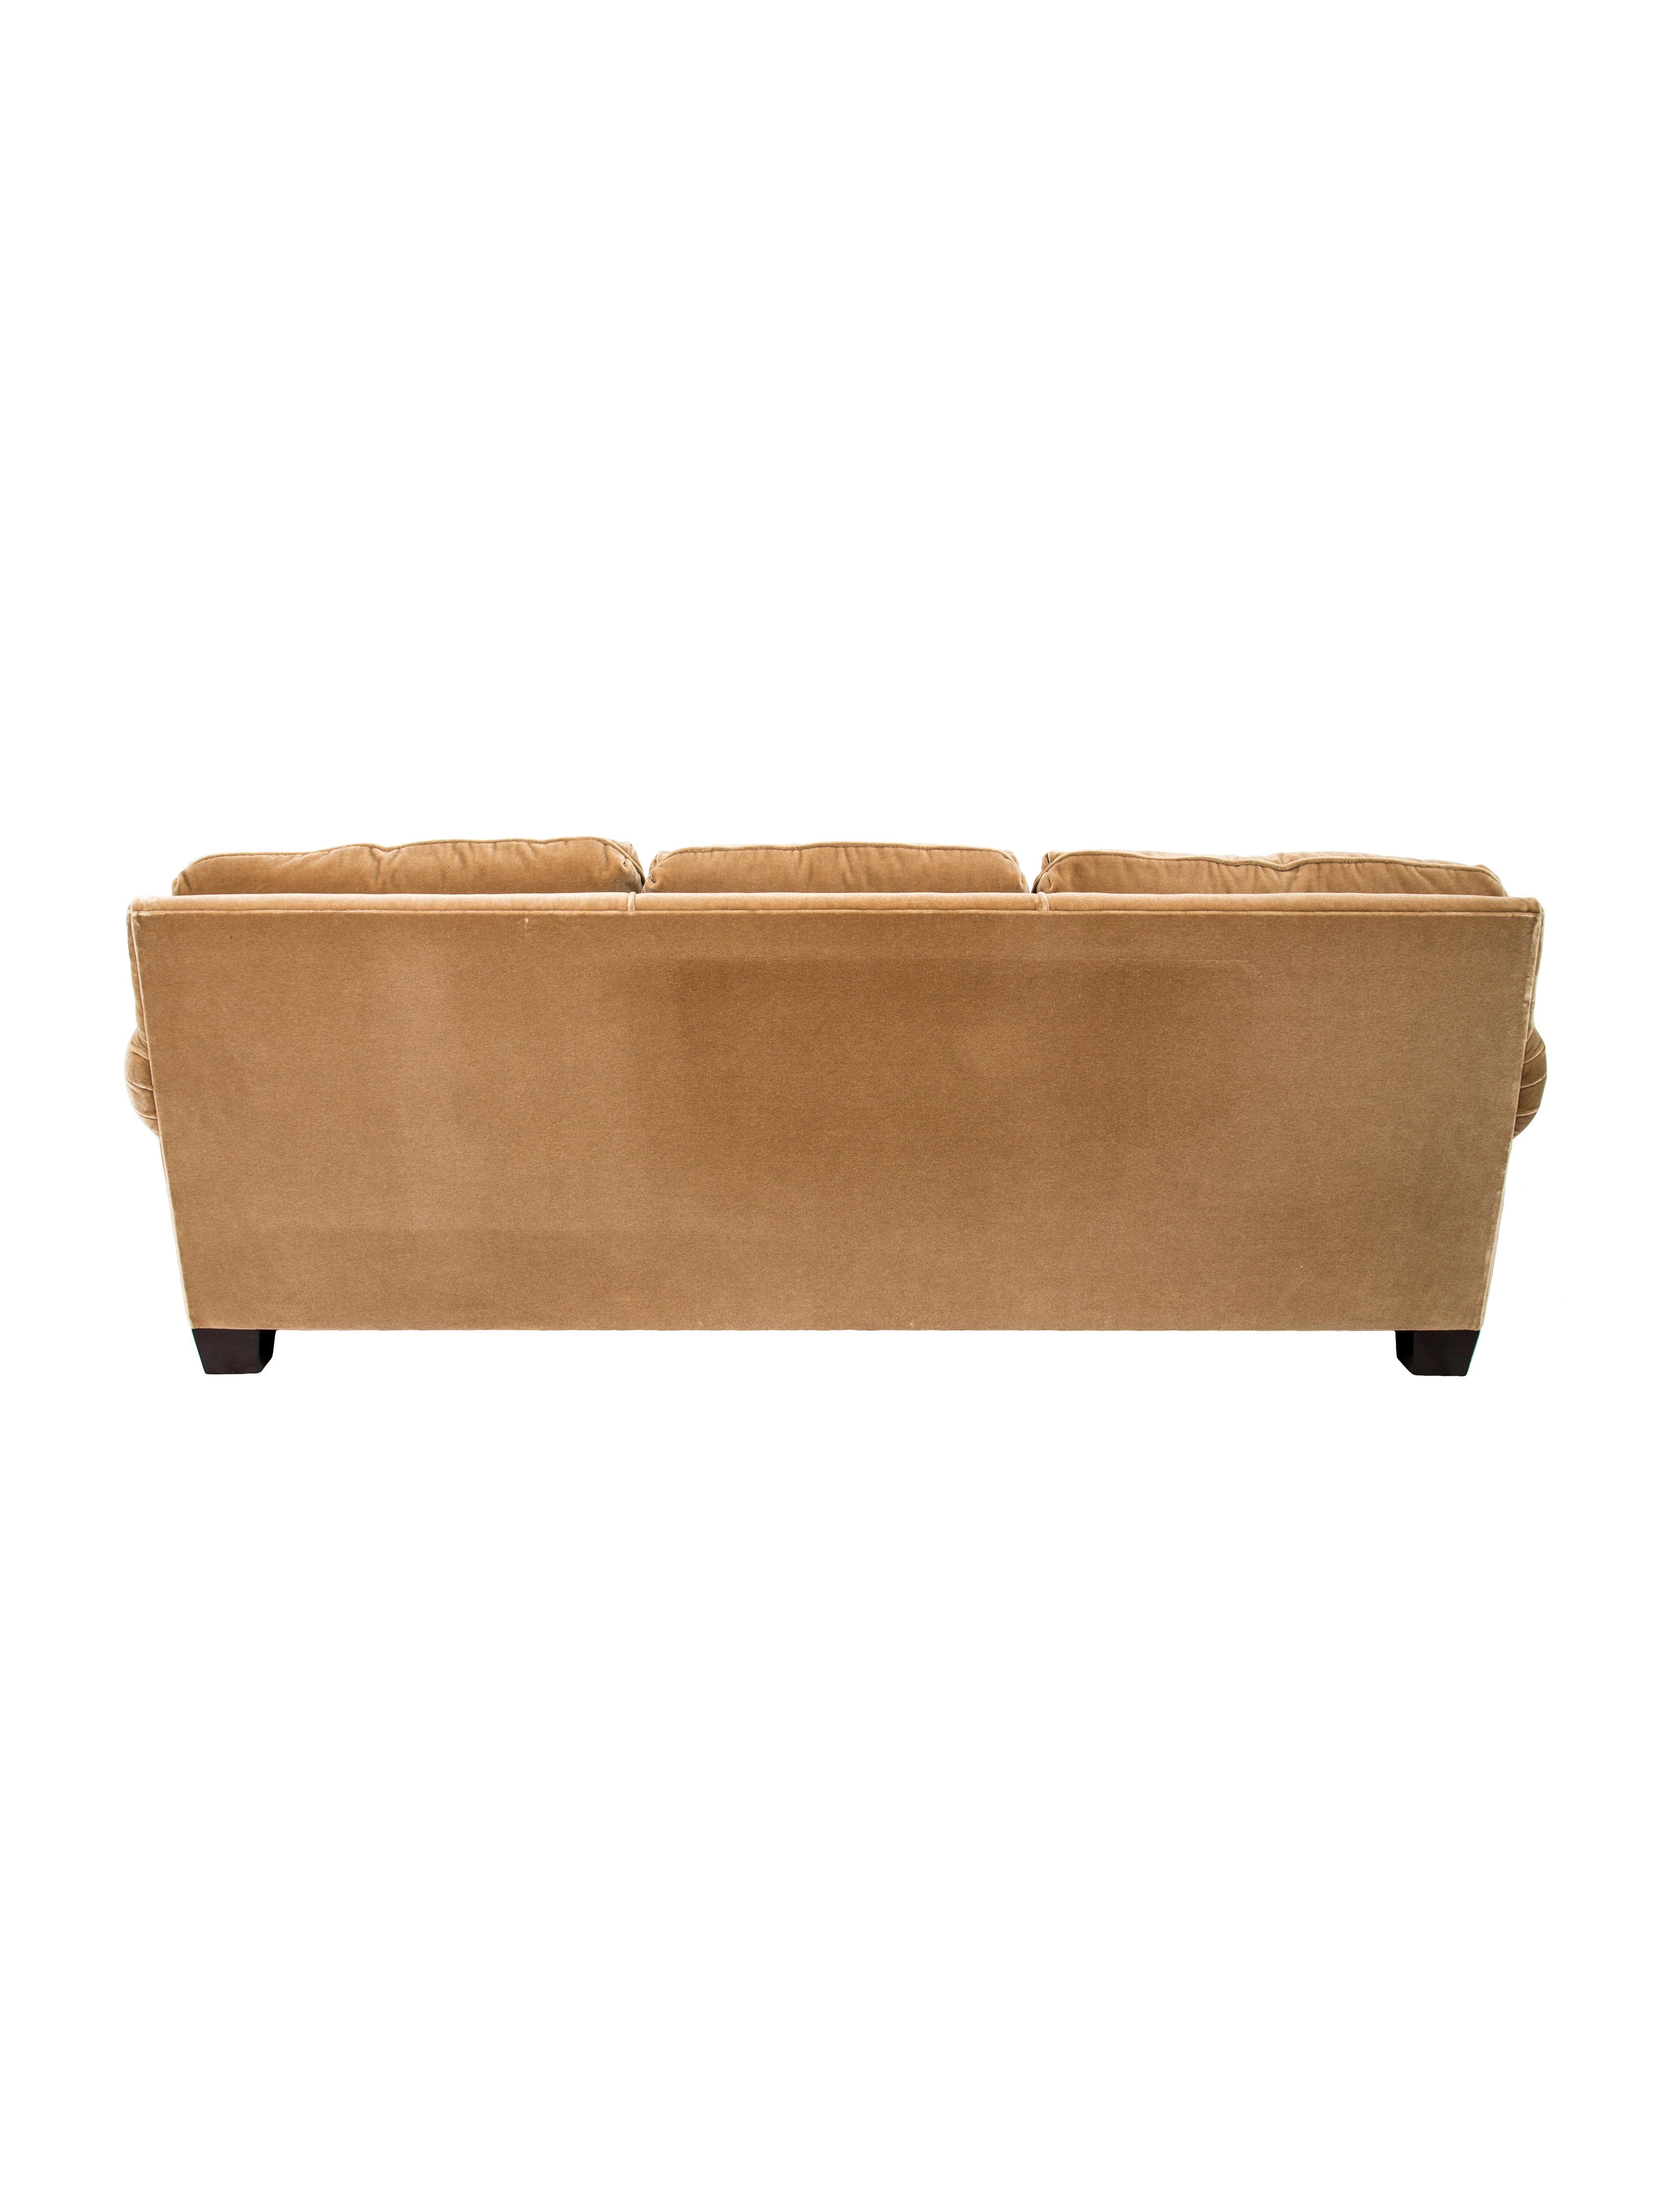 A. Rudin Velvet Three Seat Sofa